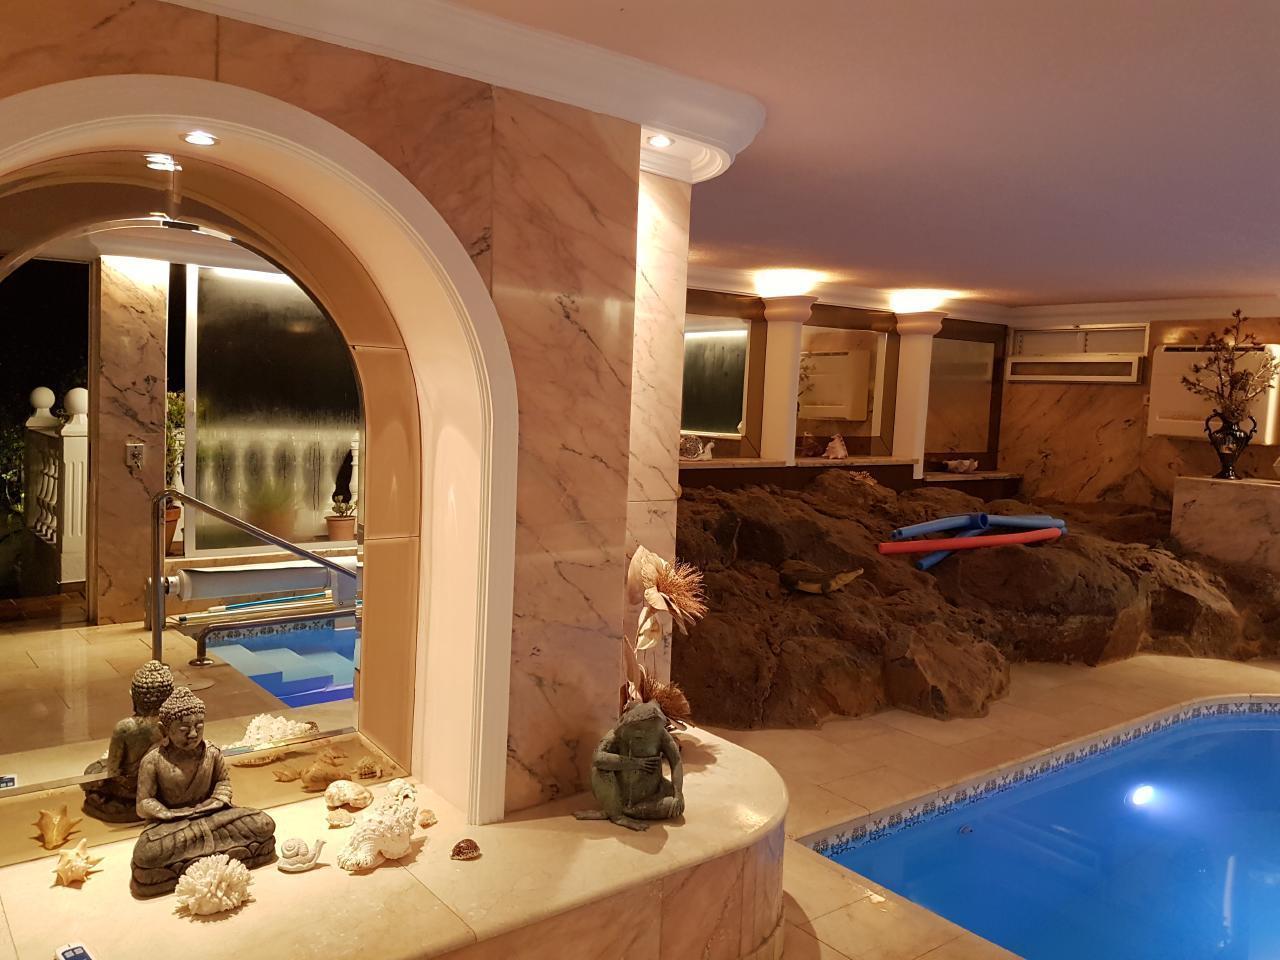 Appartement de vacances Villa Larnia Familien Apartment   * Urlaub für Körper, Geist und Seele * (2529406), El Sauzal, Ténérife, Iles Canaries, Espagne, image 9